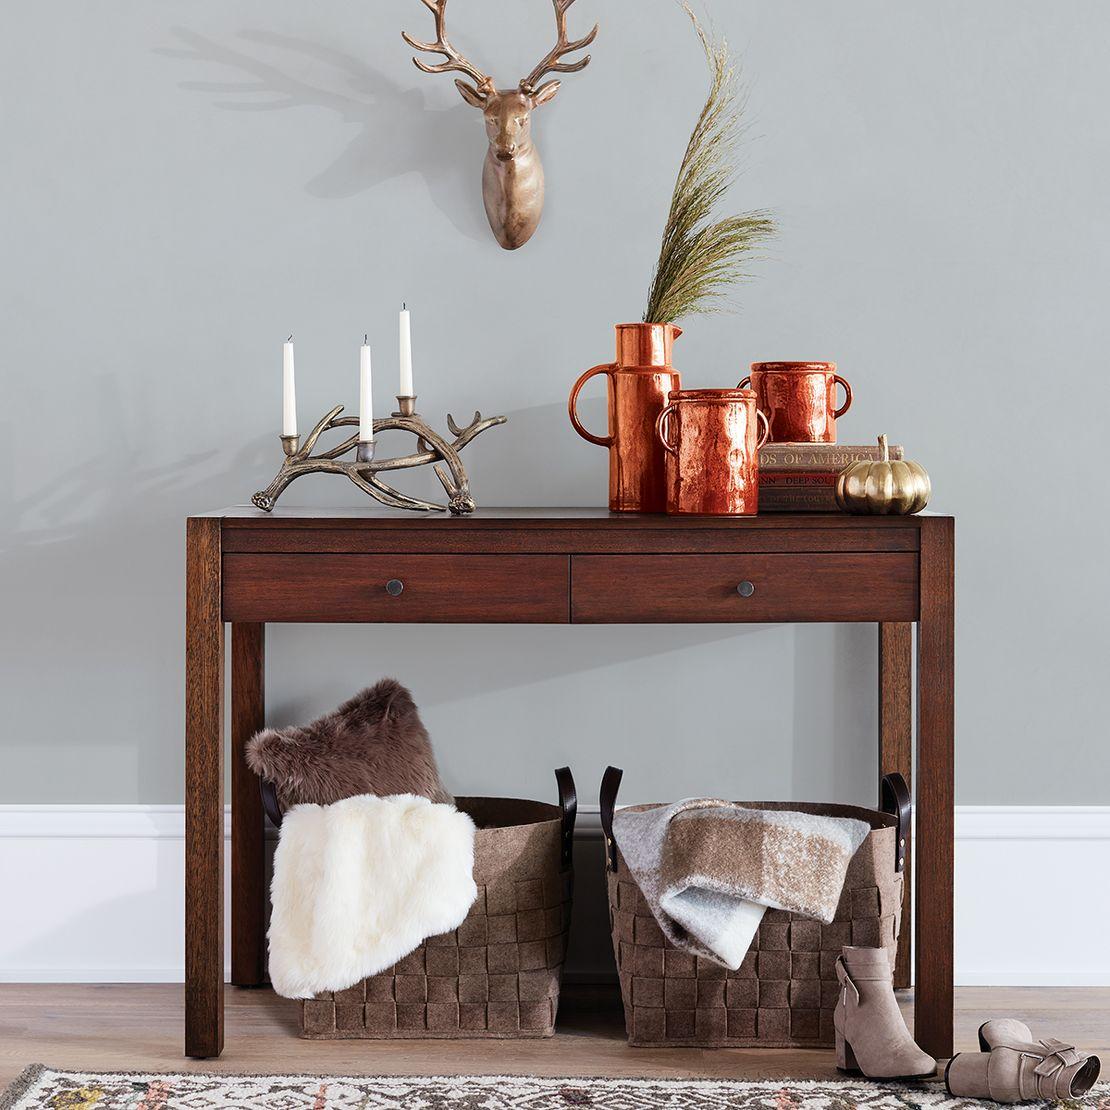 Home Target: Home : Furnishings & Decor : Target